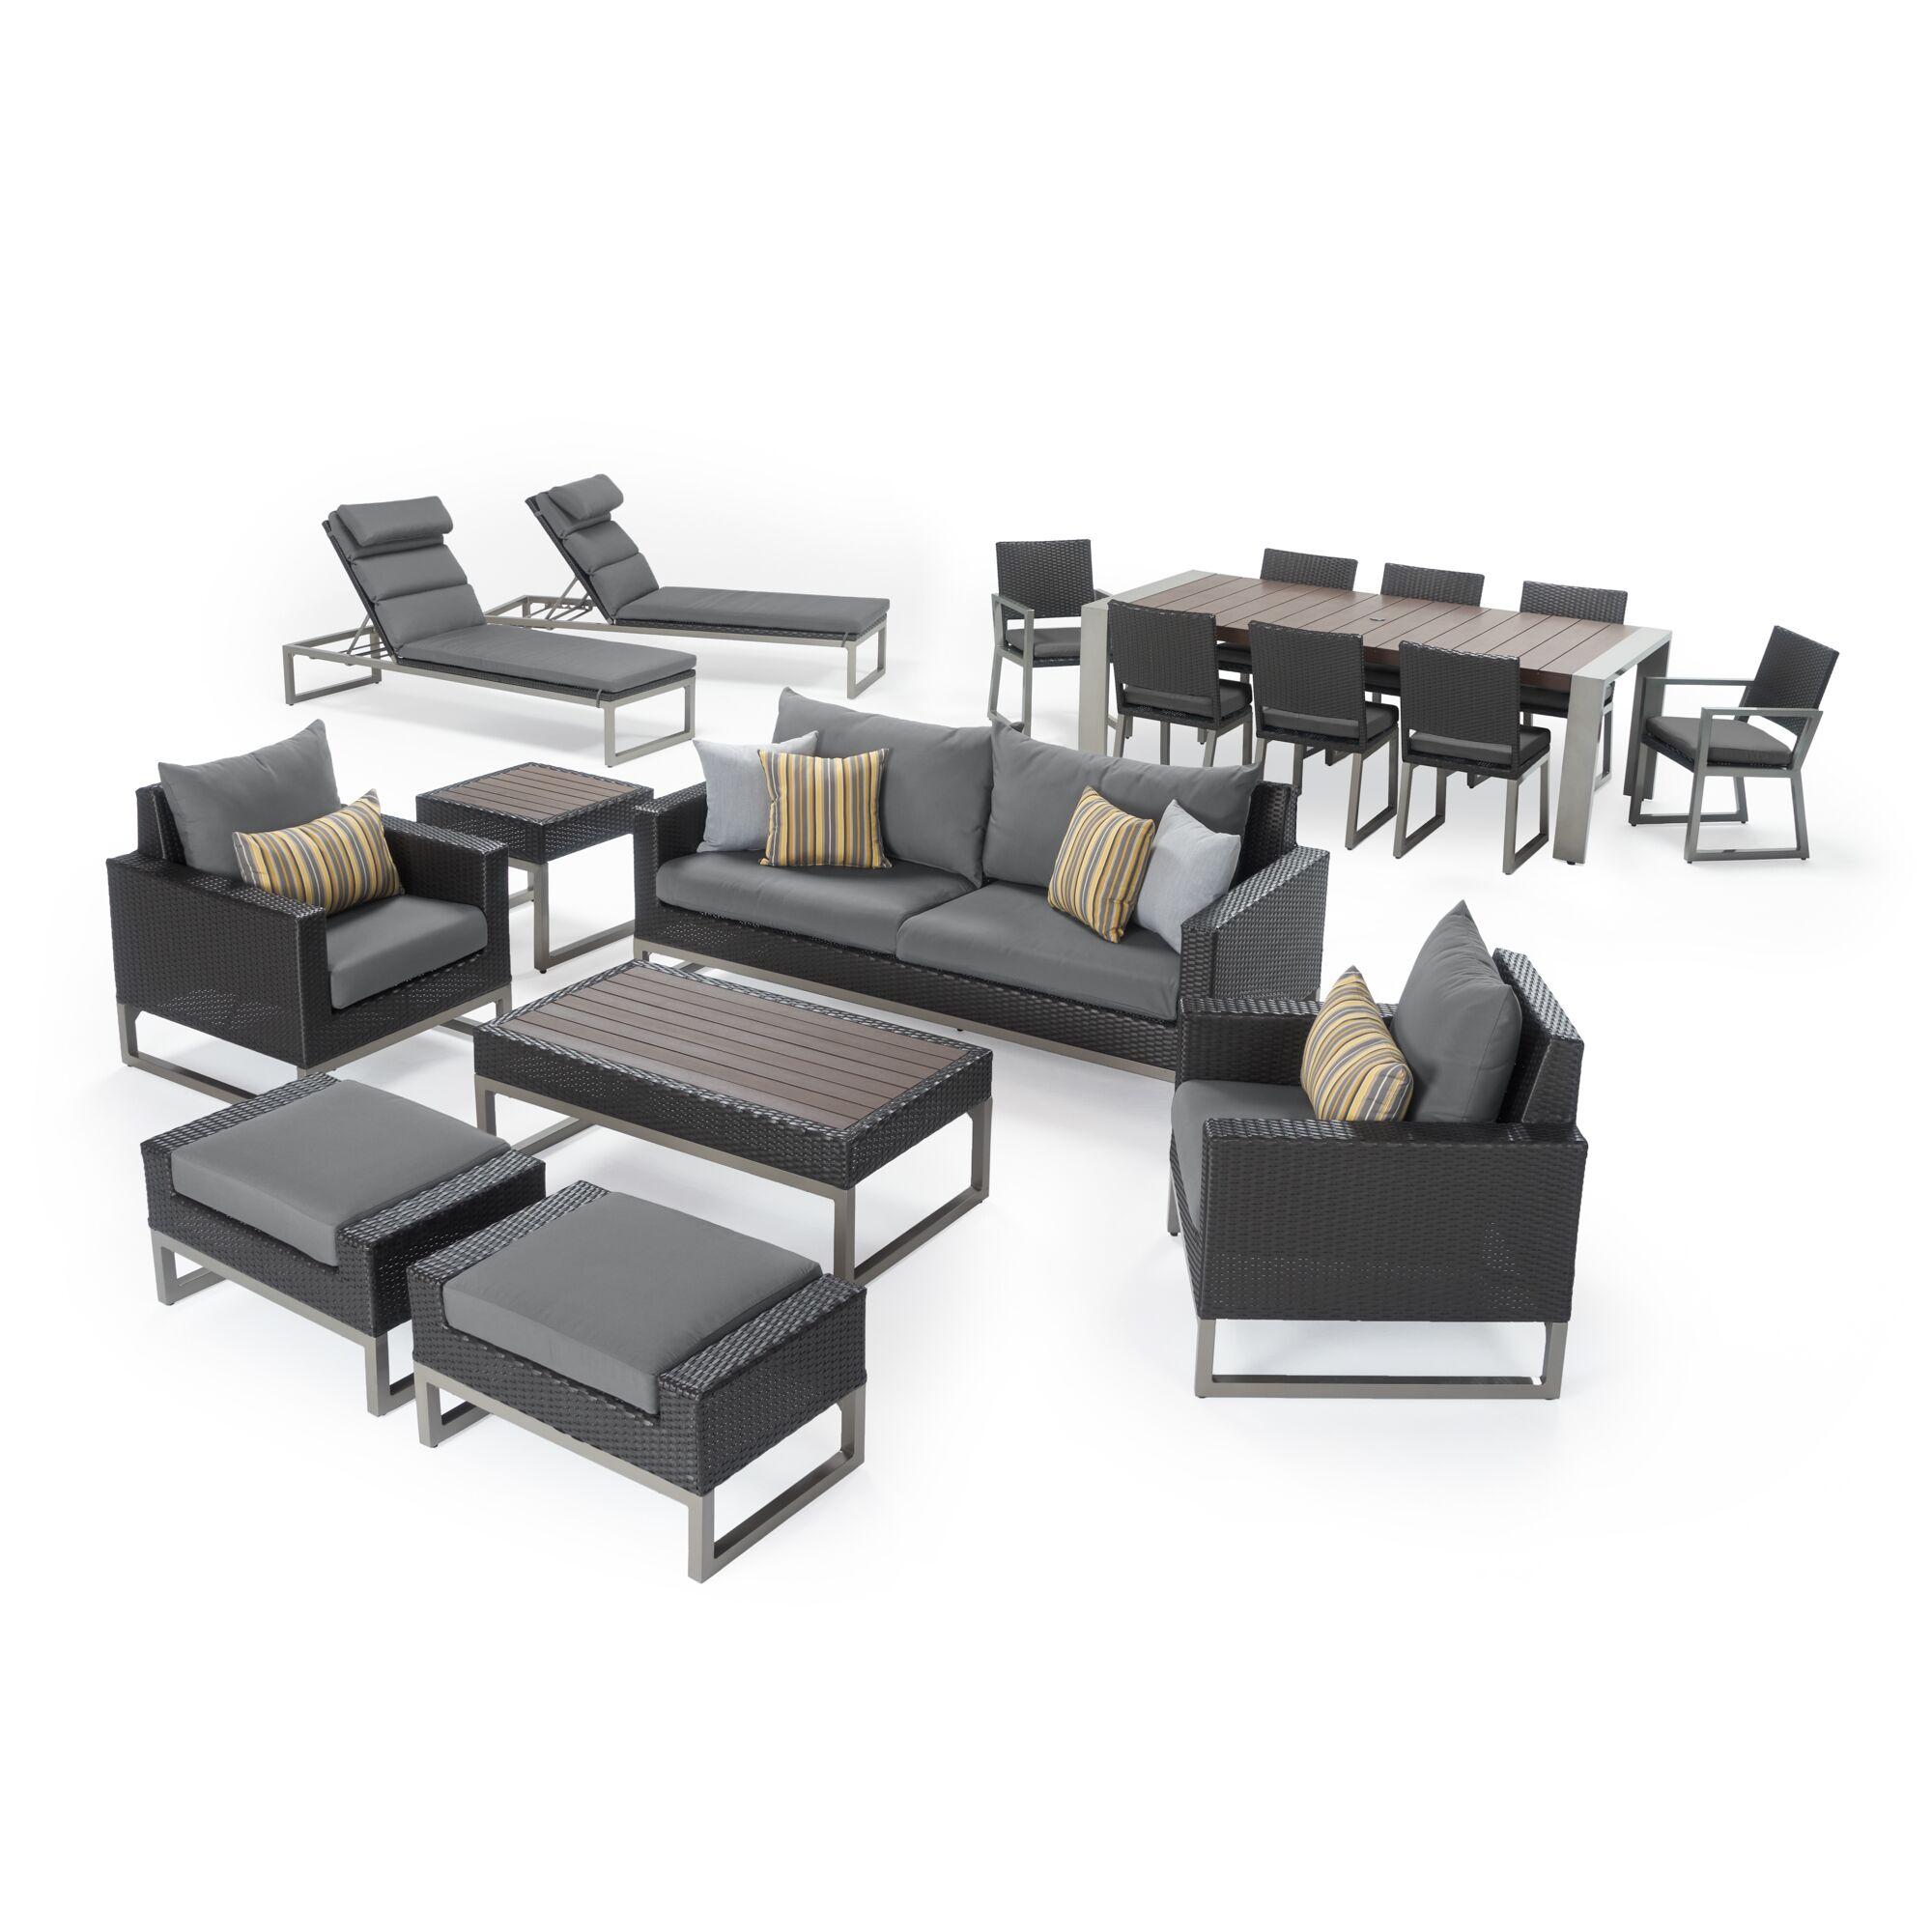 Gary 18 Piece Rattan Sunbrella Conversation Set with Cushions Cushion Color: Charcoal Gray, Frame Finish: Espresso